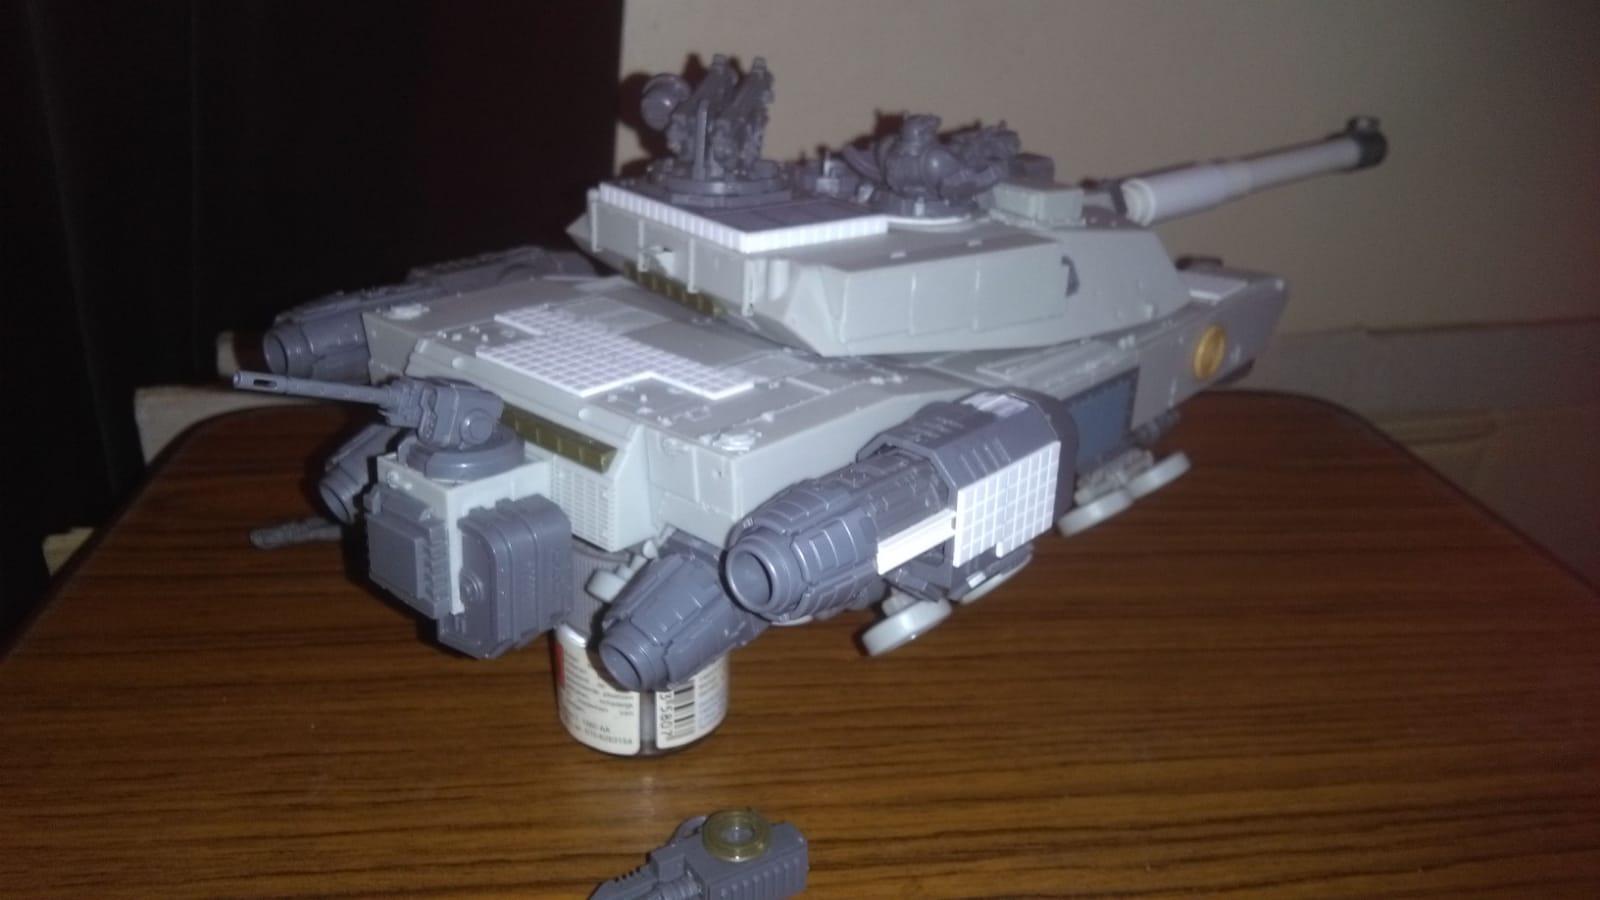 Conversion, Epsilon, Hovertank, Korbenn, Sigma, Space, Space Marines, Tank, Warhammer 40,000, Warhammer Fantasy, Warriors